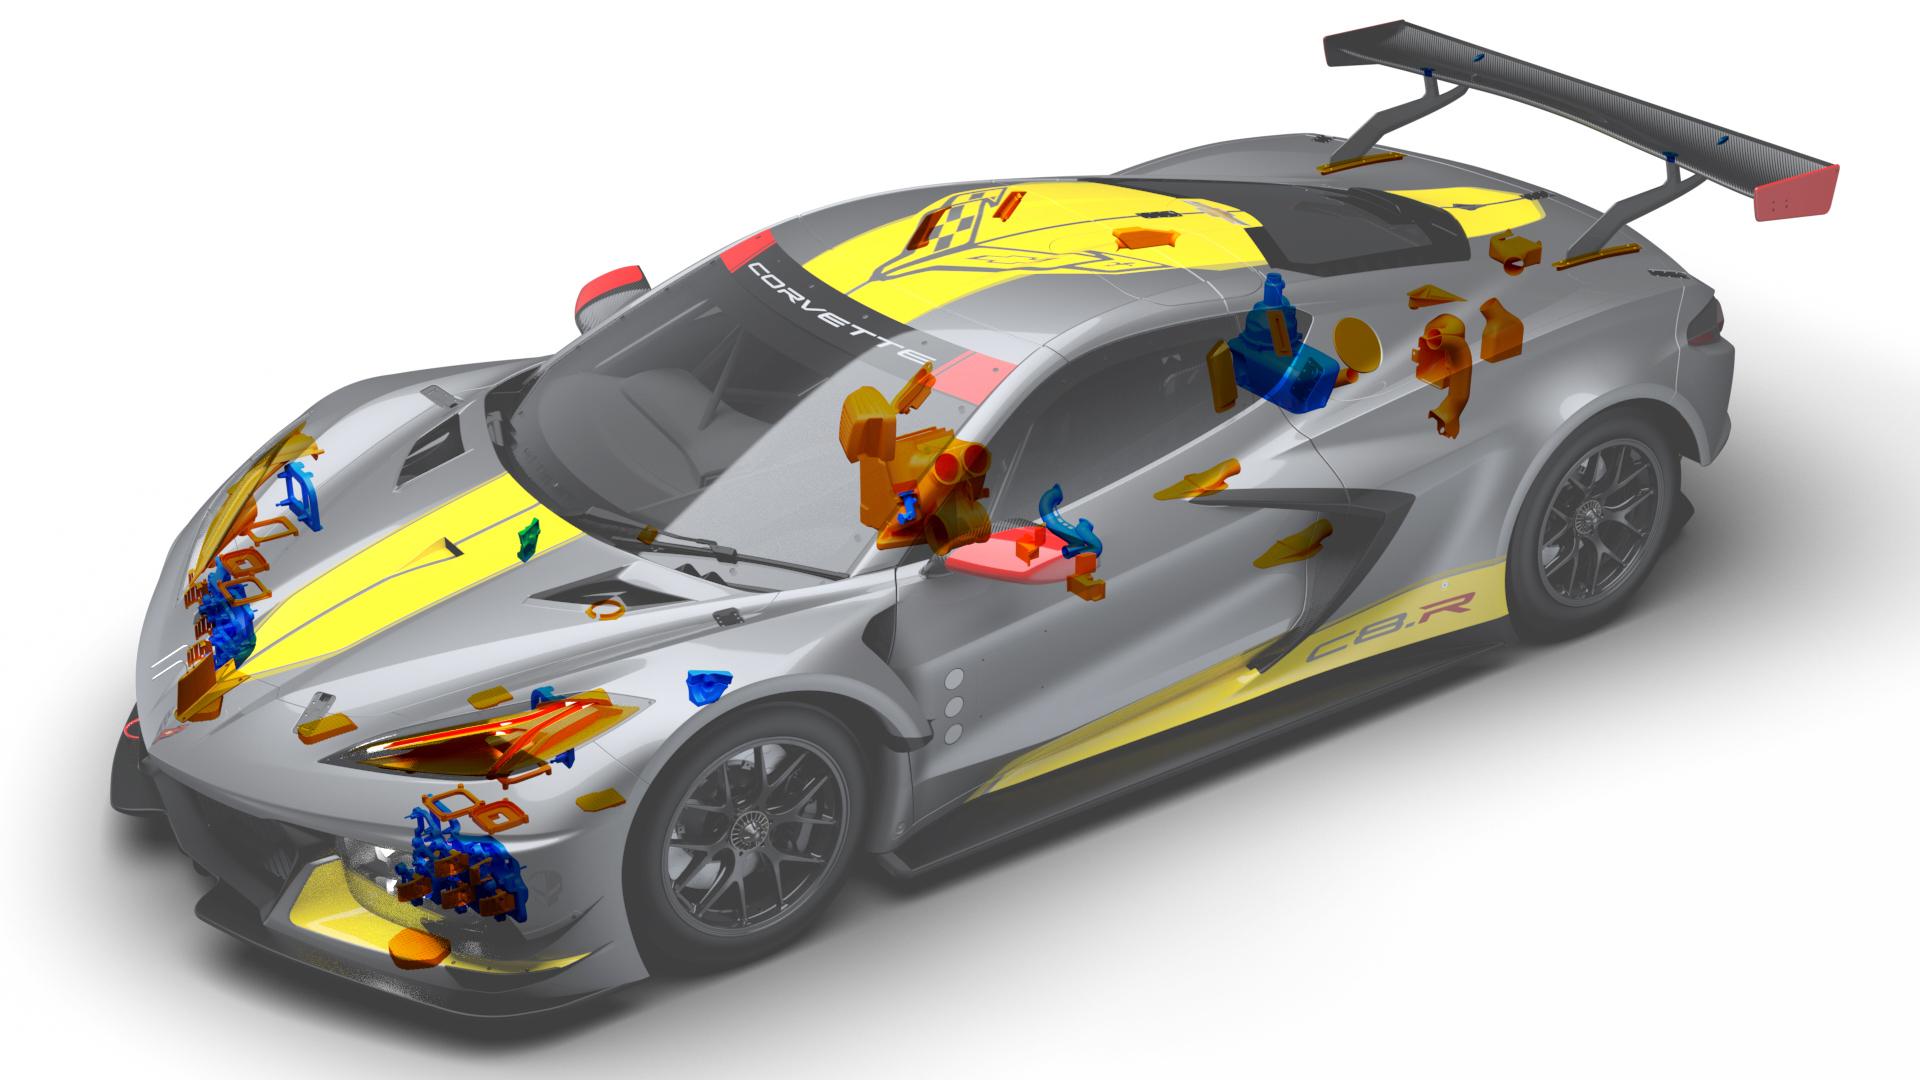 Corvette-C8.R-with-3D-printed-parts.jpg